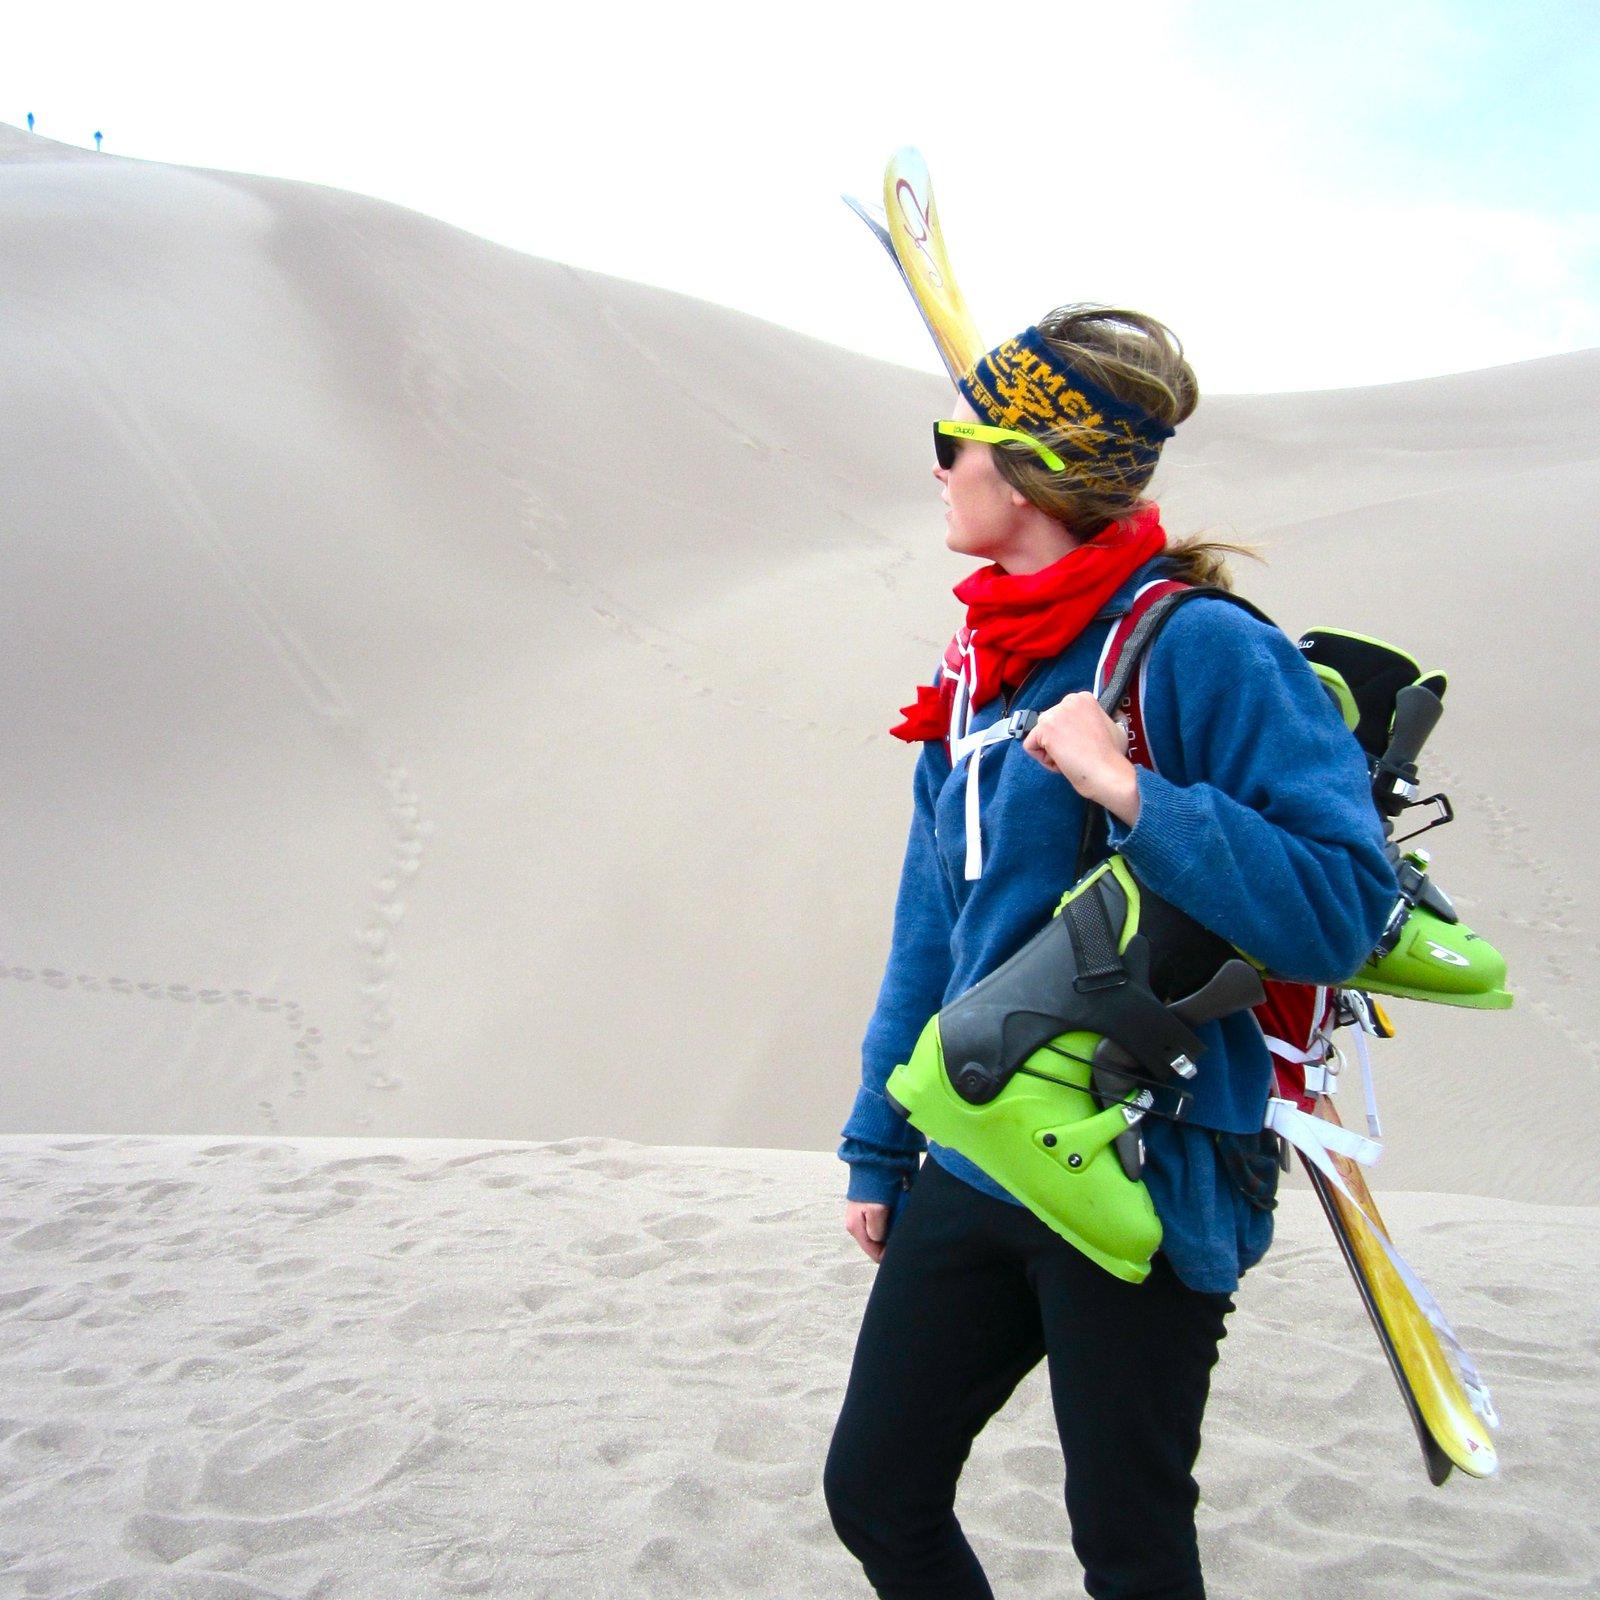 skiing on sand